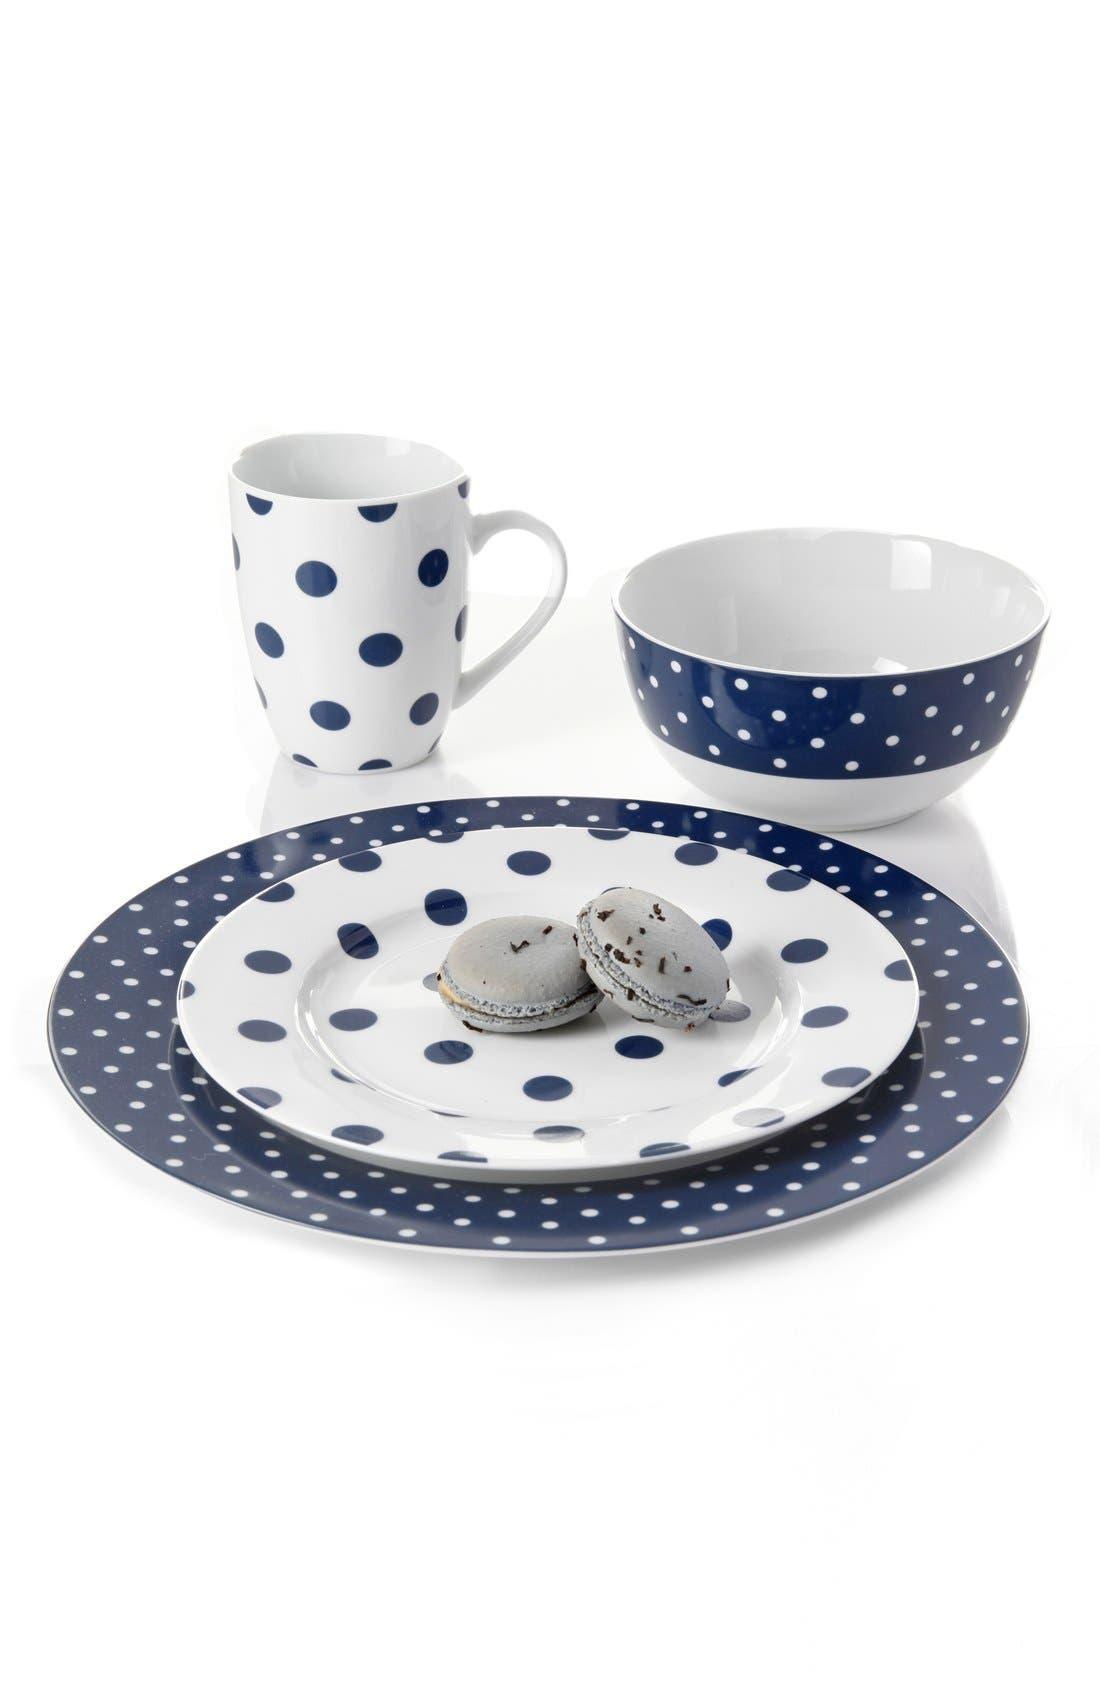 sc 1 st  Nordstrom & Isaac Mizrahi u0027Dot Luxeu0027 Porcelain Dinnerware Set | Nordstrom